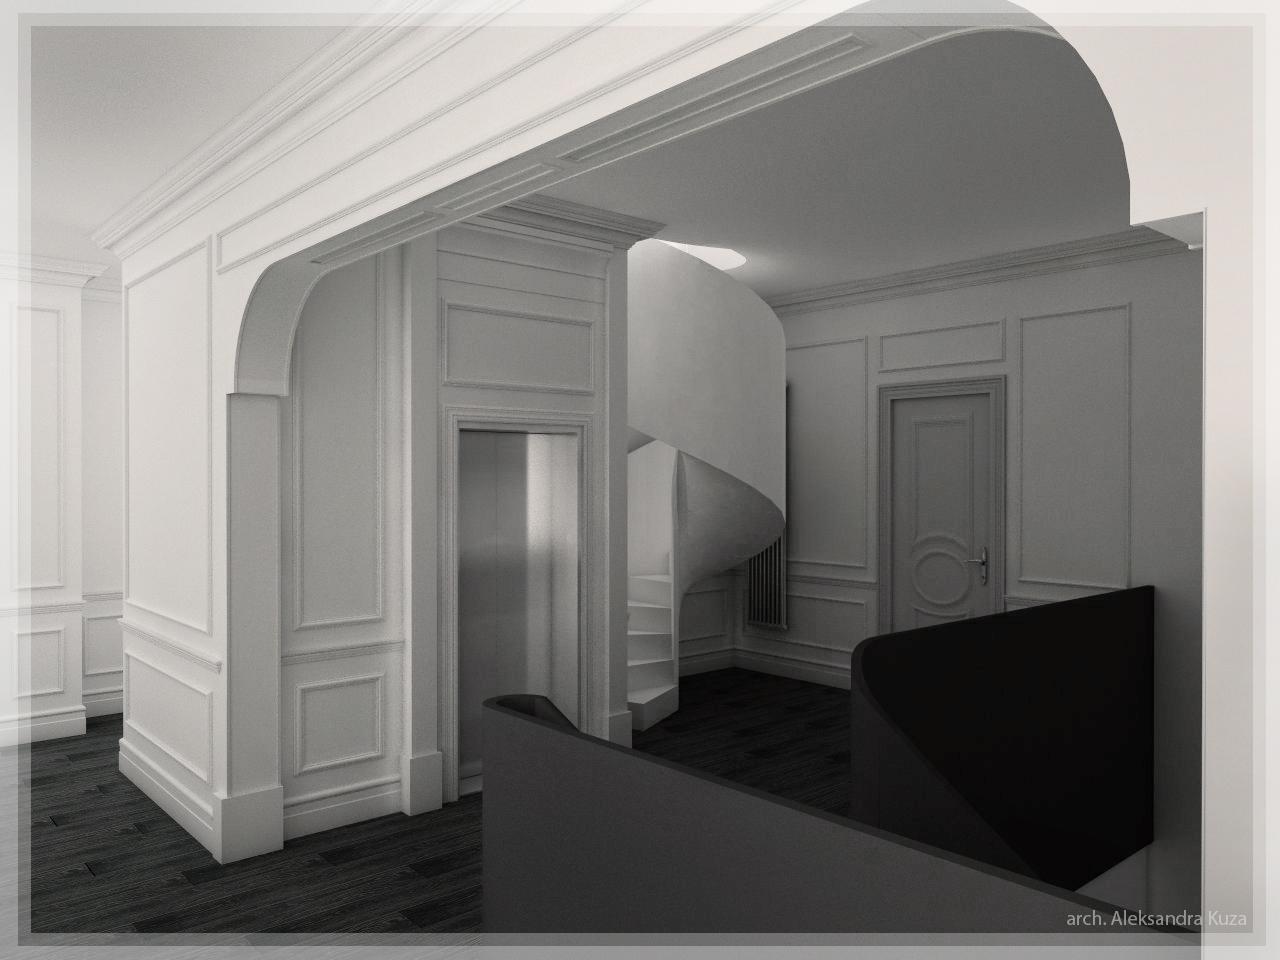 Rezydencja Dom jednorodzinny projekt Aleksandra Kuza